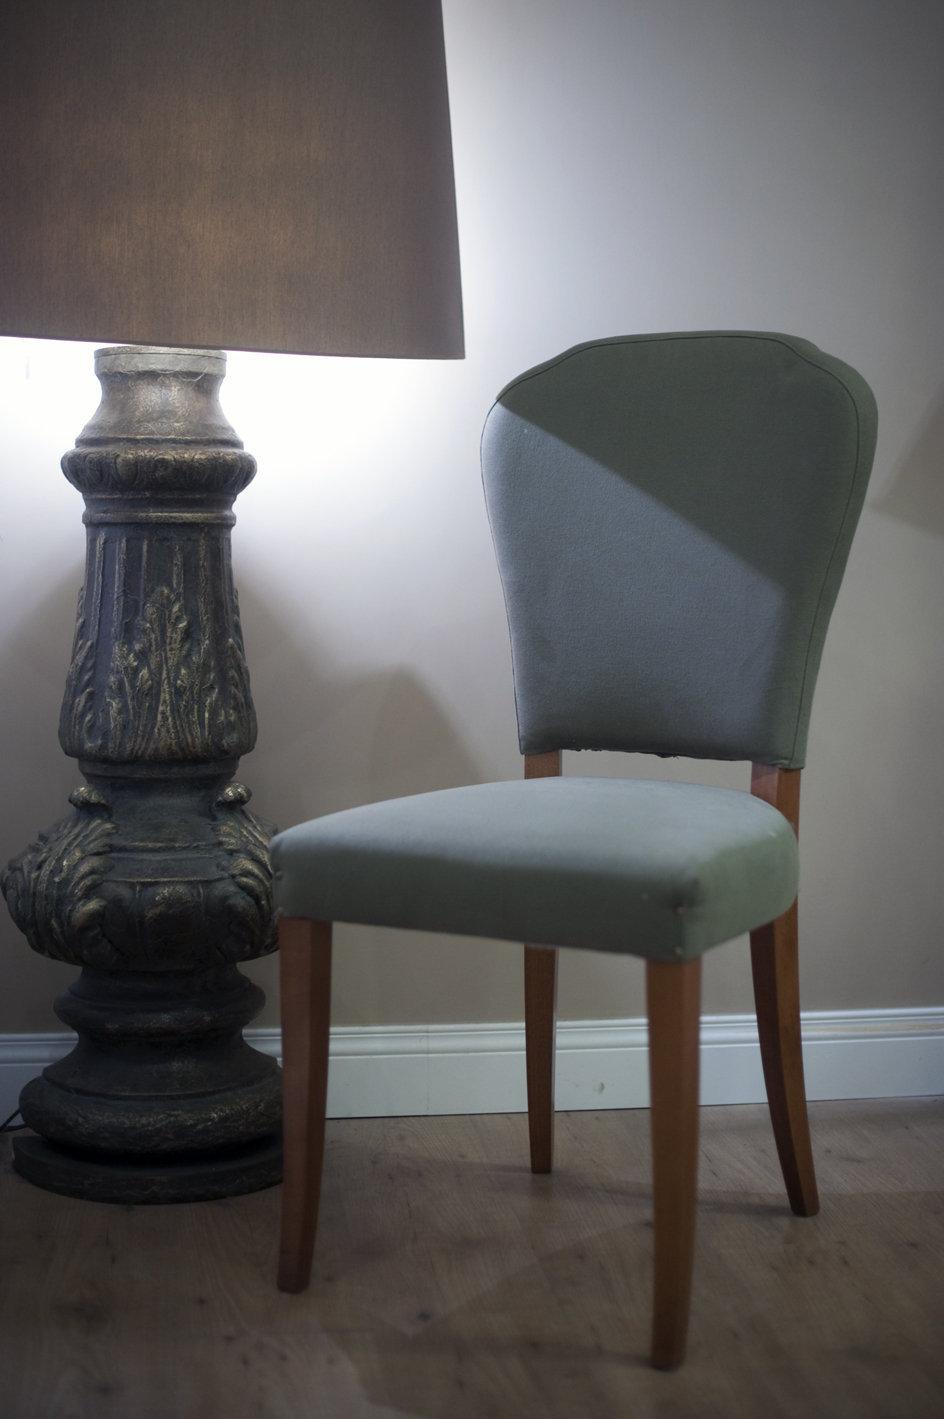 sedie pierre frey 1300, 520 (FILEminimizer)